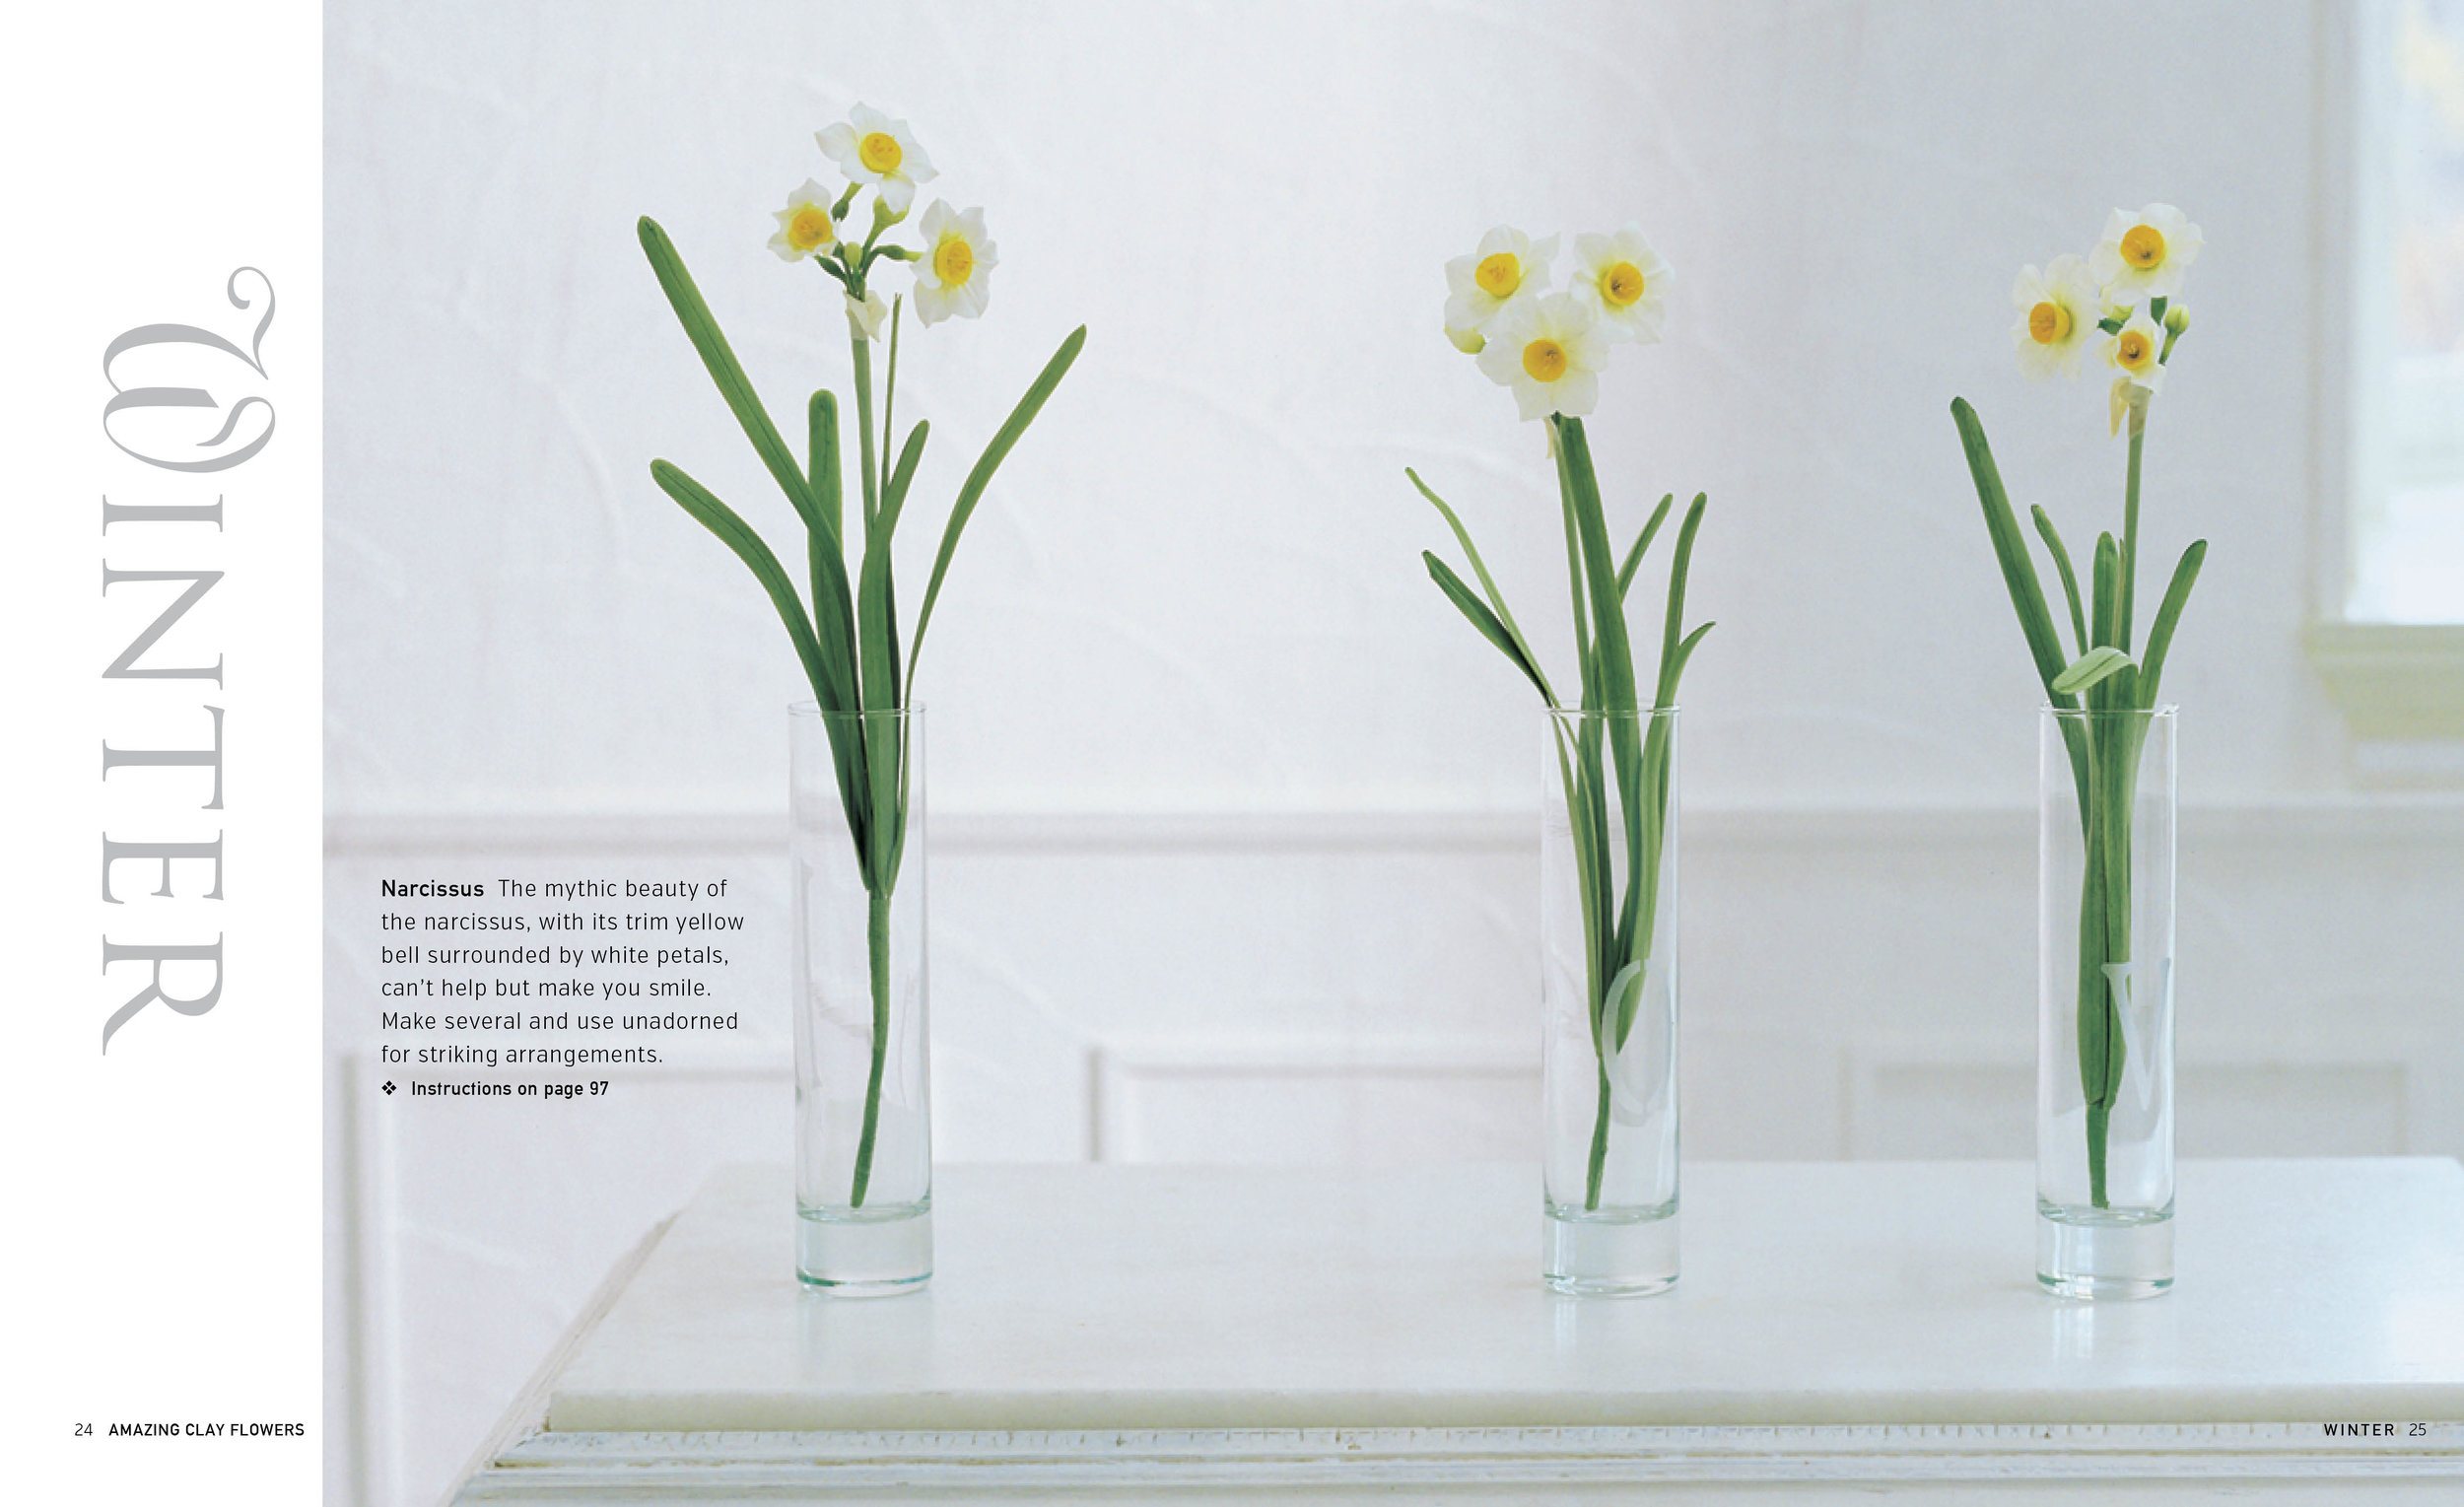 Amazing Clay Flowers 24.25.jpg